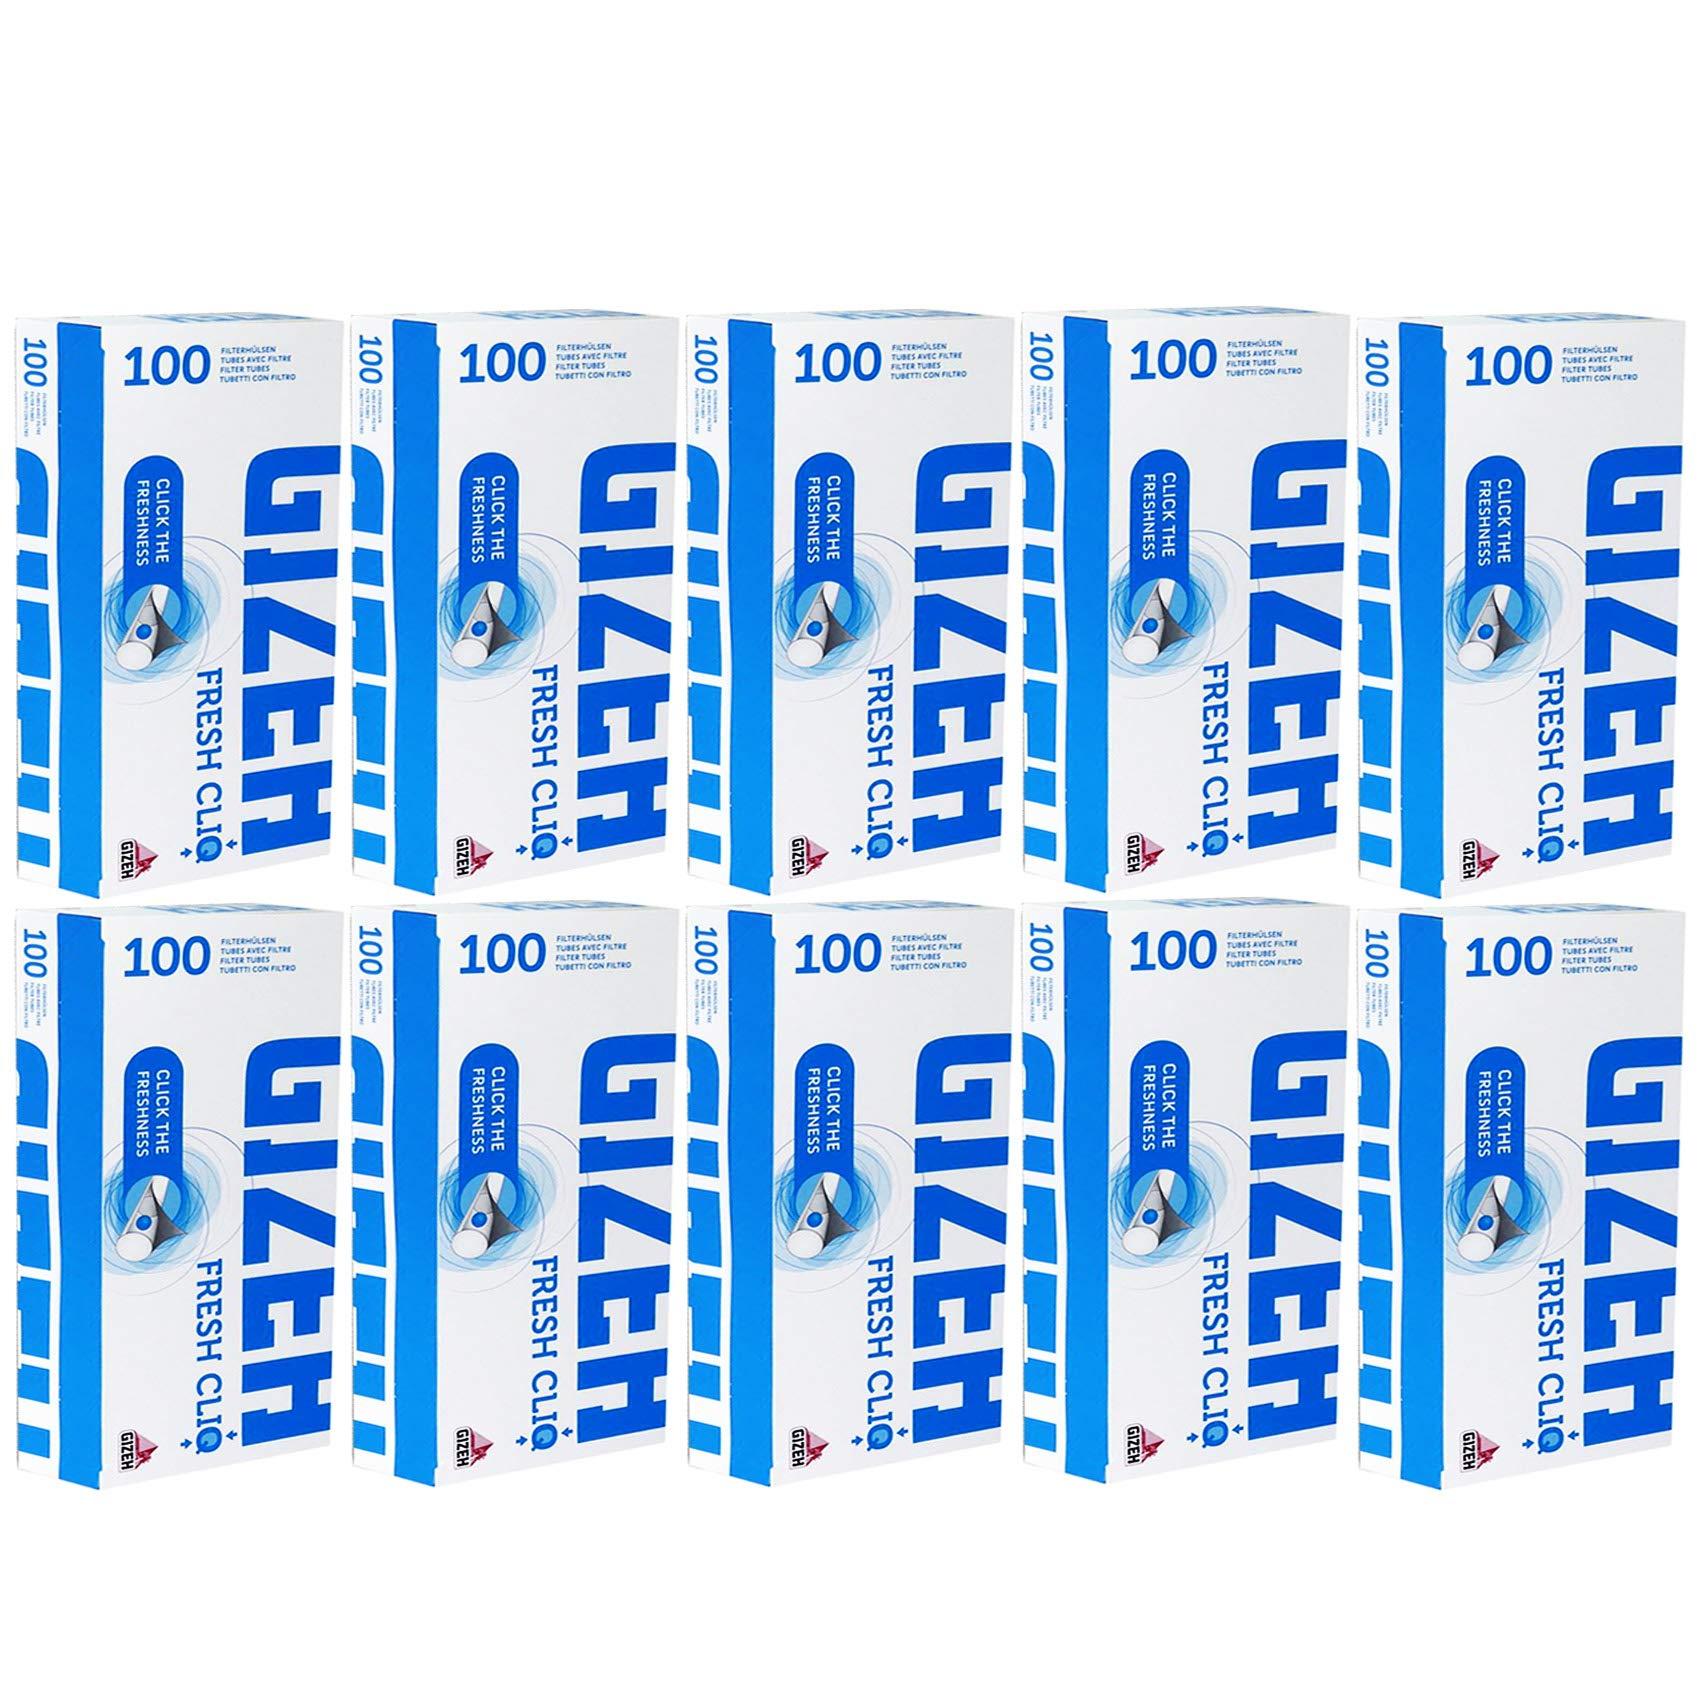 200-2000 x GIZEH Filter MENTHOL CRUSHBALL Smoking TUBES Cigarette Tobacco Fresh CLIQ Capsule Tips UK FREE P&P (1000 x GIZEH MENTHOL CLIQ TUBES)